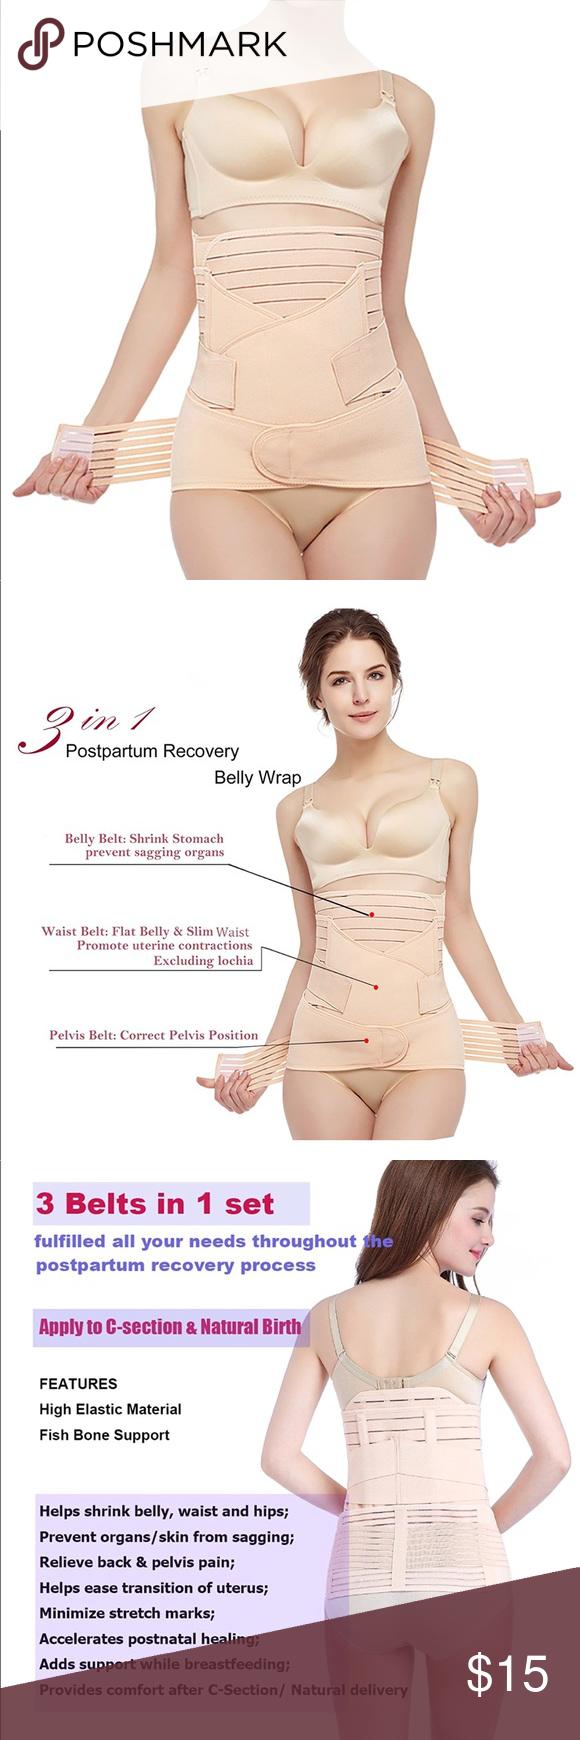 New Post Partum Girdle Waist Trainer Belly Wrap Post Partum Girdle Postpartum Belly